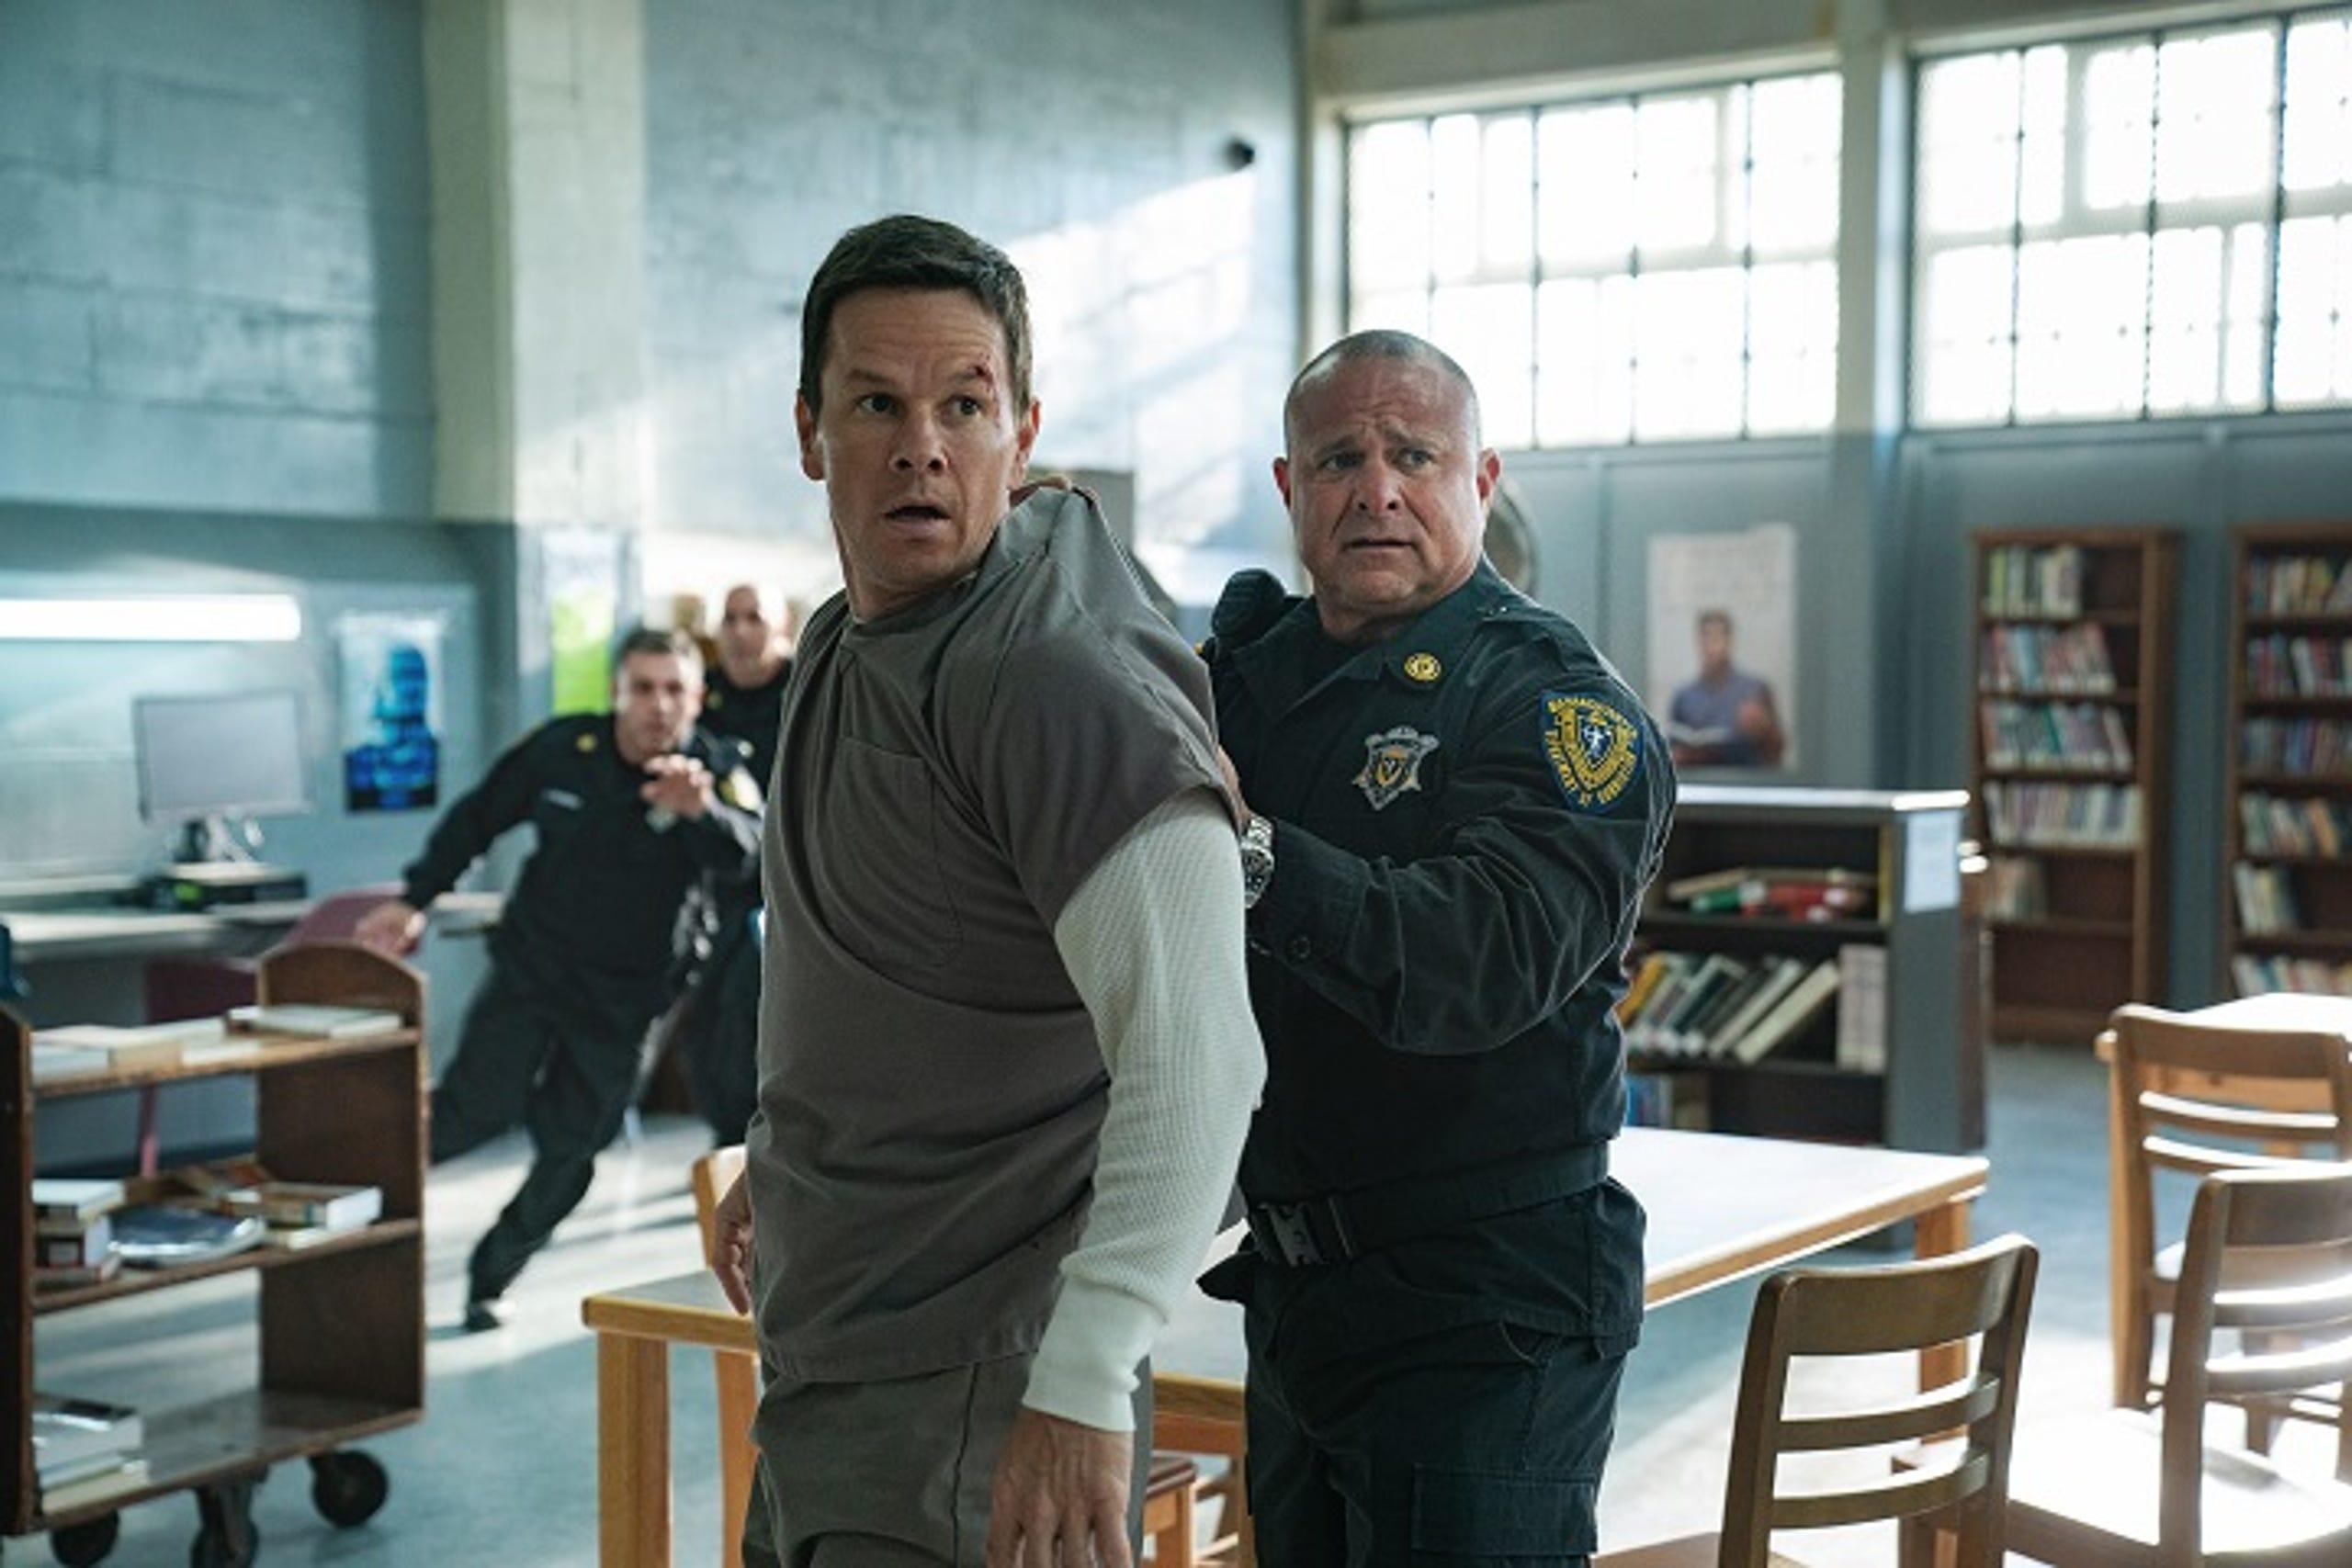 Spenser Confidential Mark Wahlberg Gets Roughed Up Fighting Crime